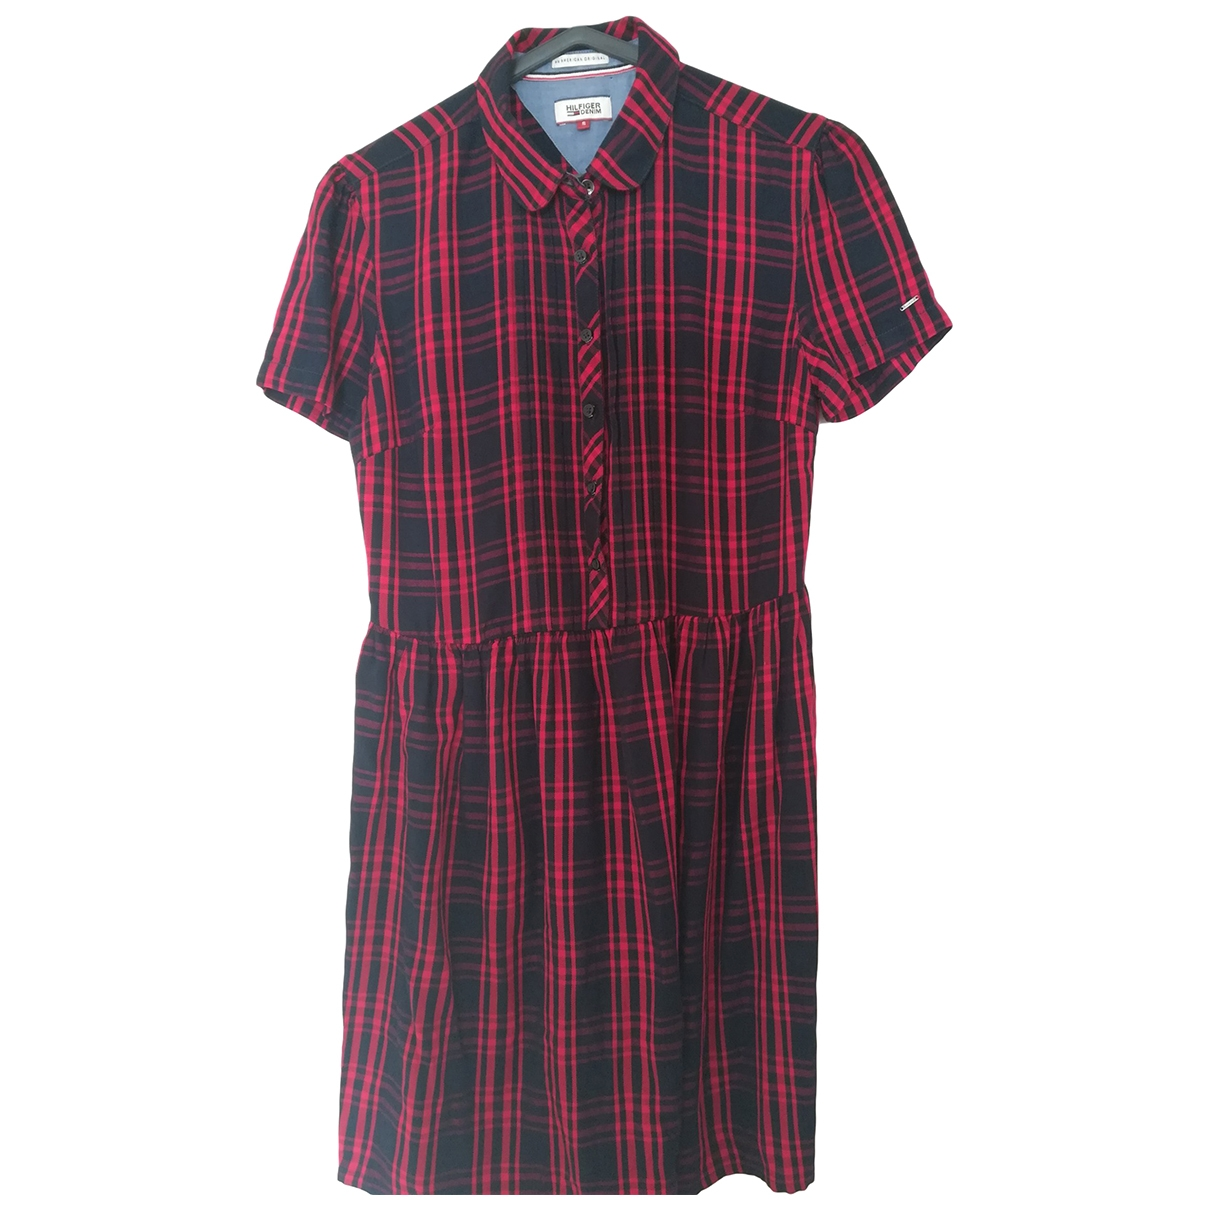 Hilfiger Collection \N Kleid in  Blau Baumwolle